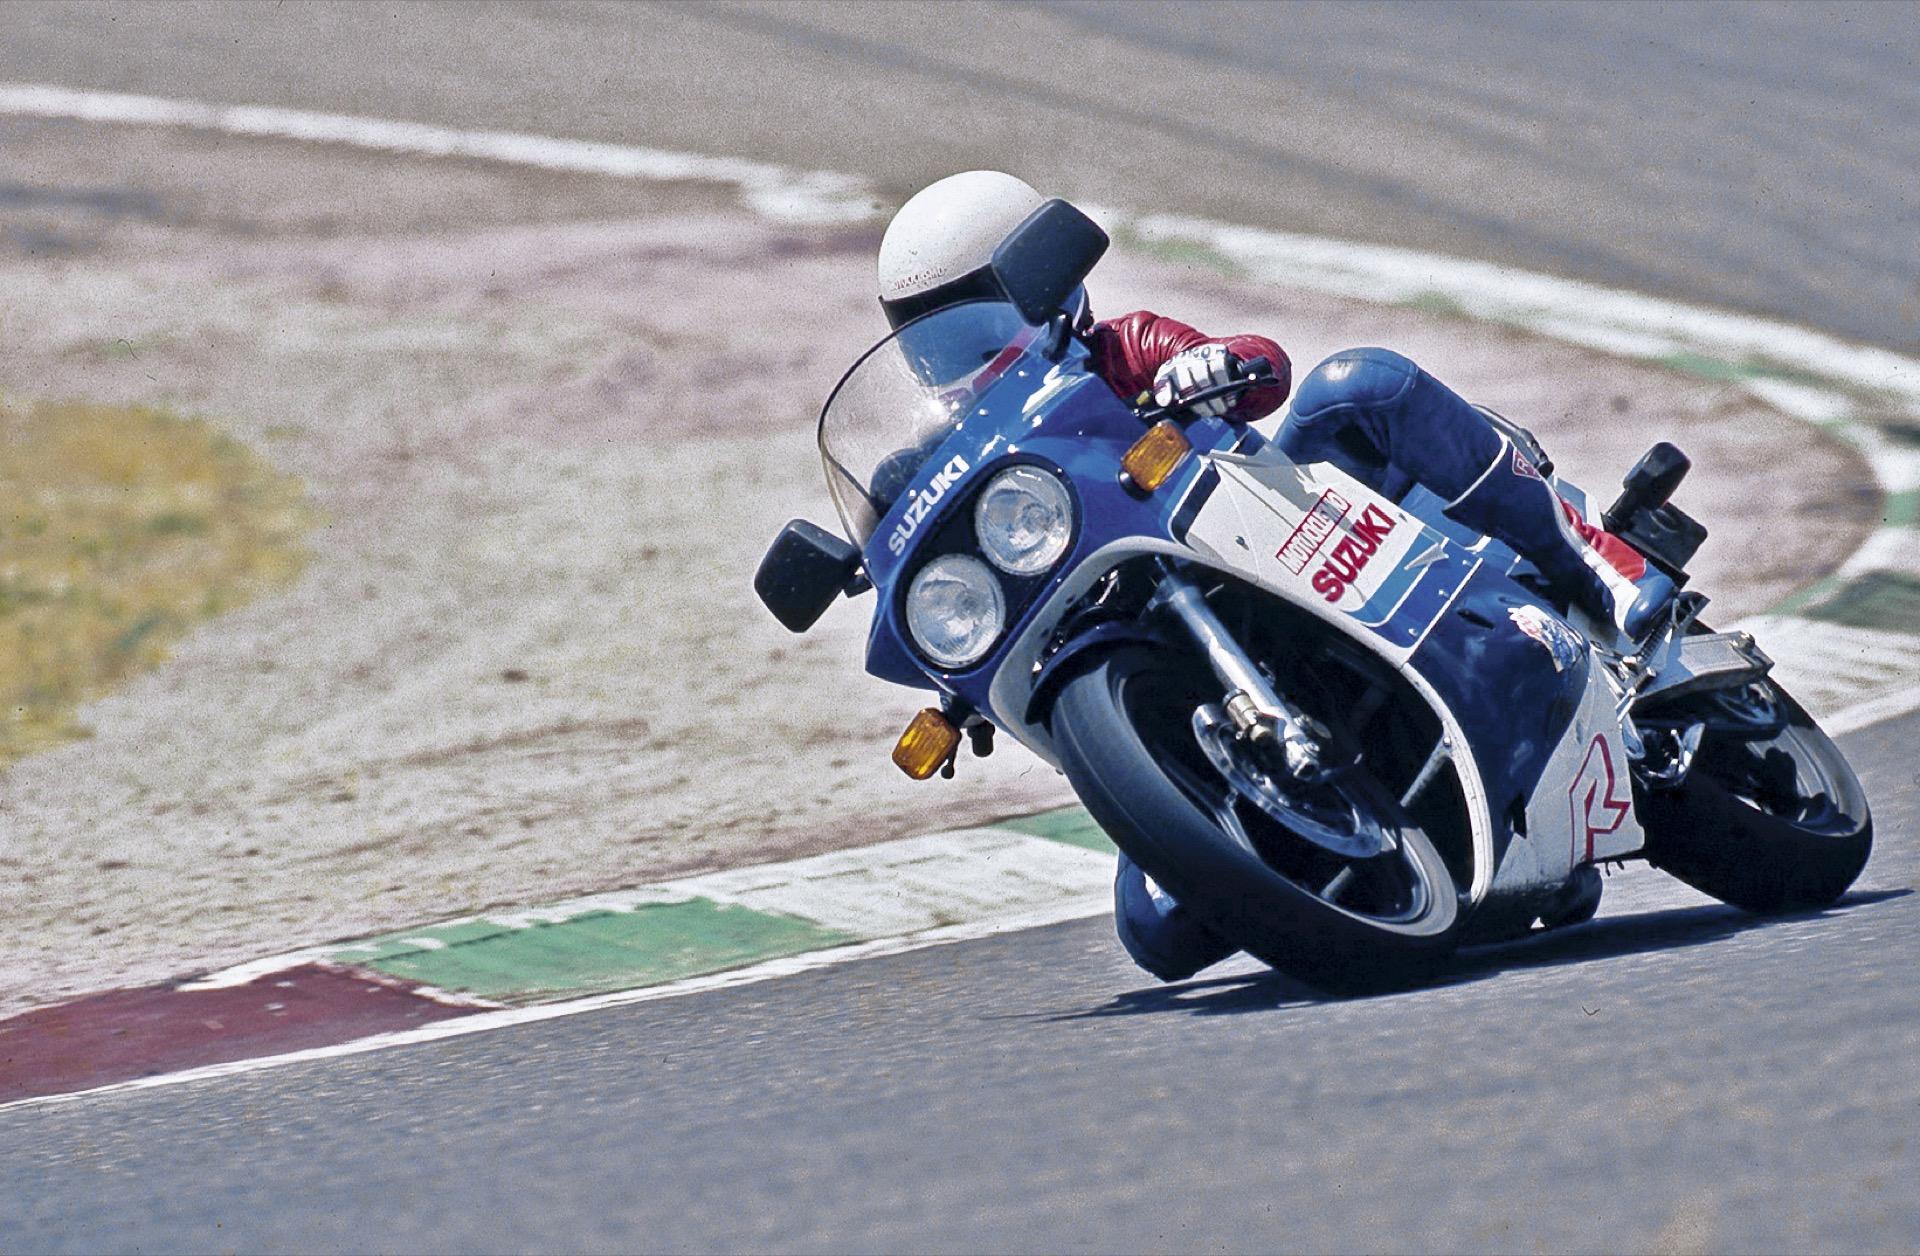 Retroprueba revista Motociclismo: Suzuki GSX 750 R 1985 Paragrapharticle-63157-57d053ad56447